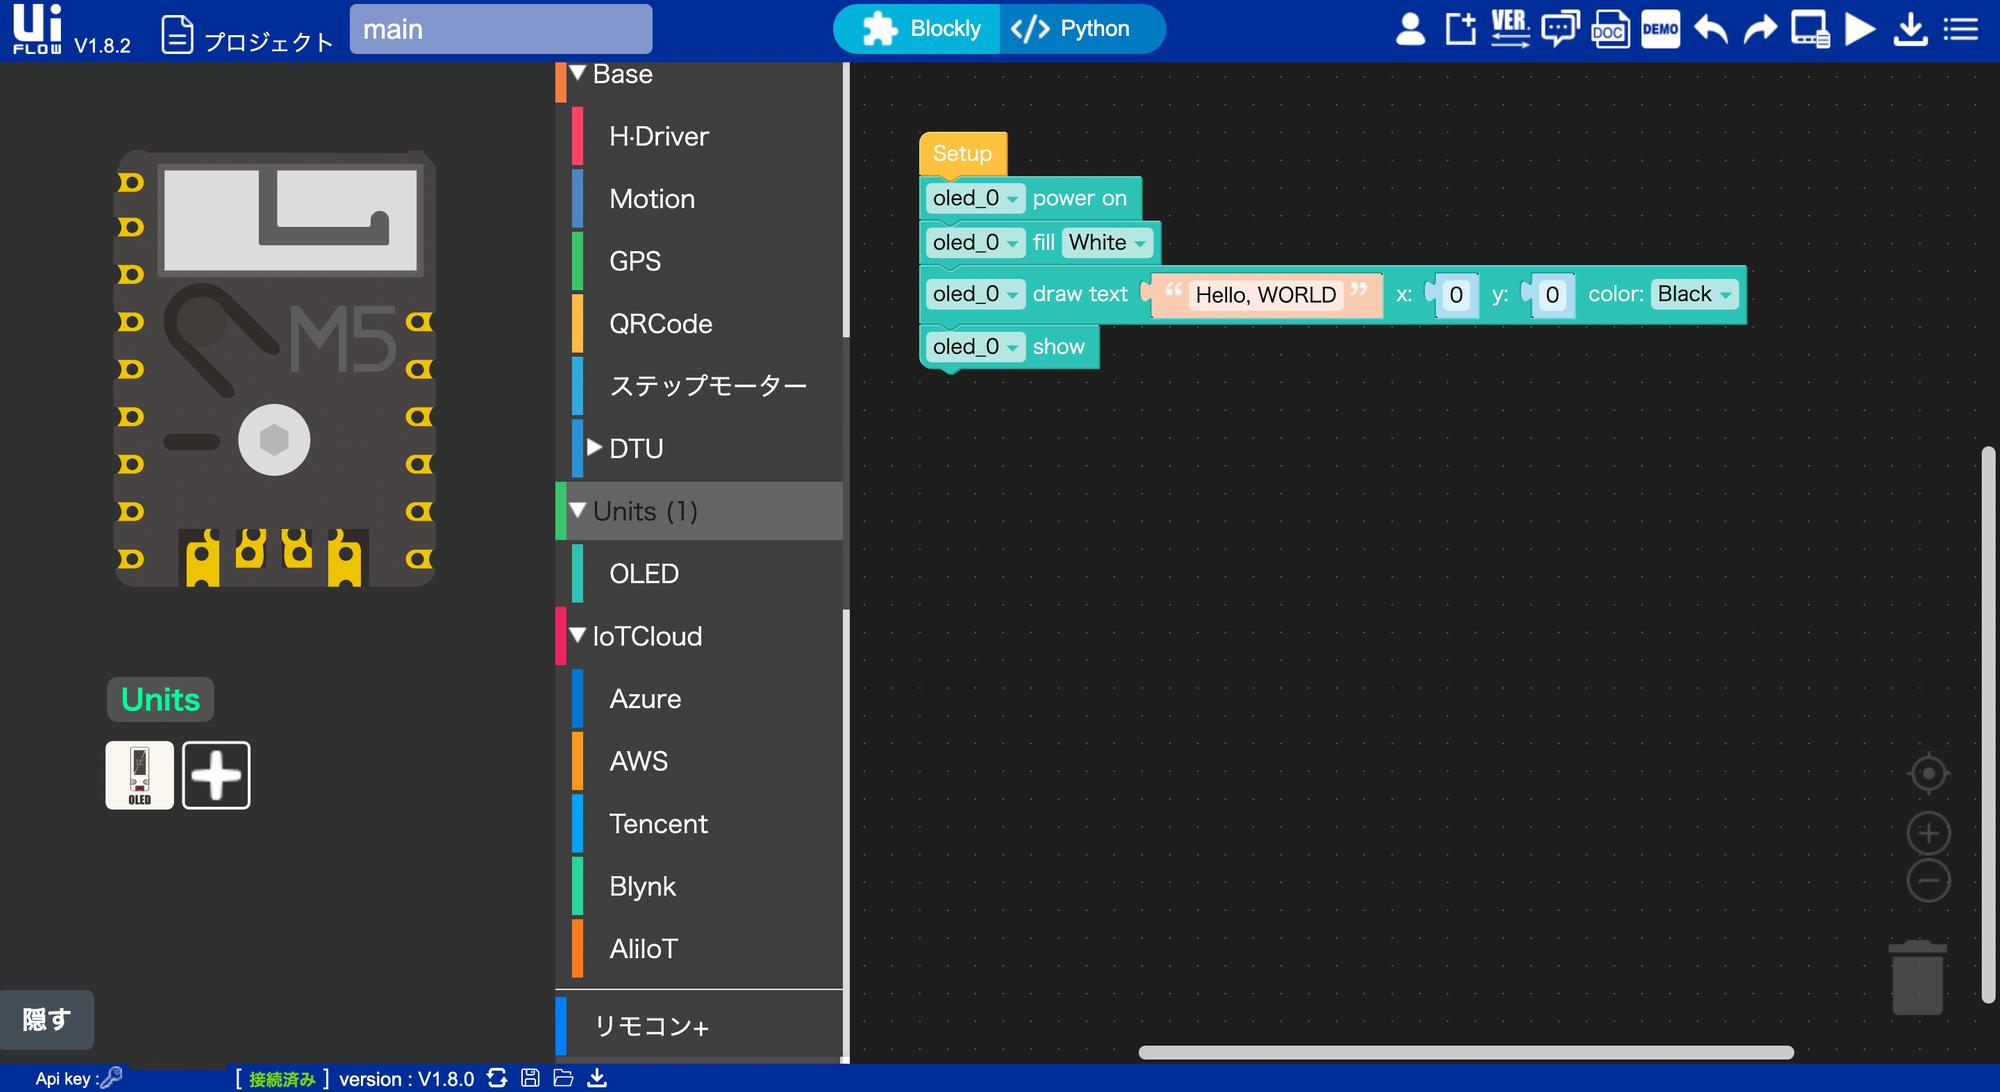 UIFlow screen